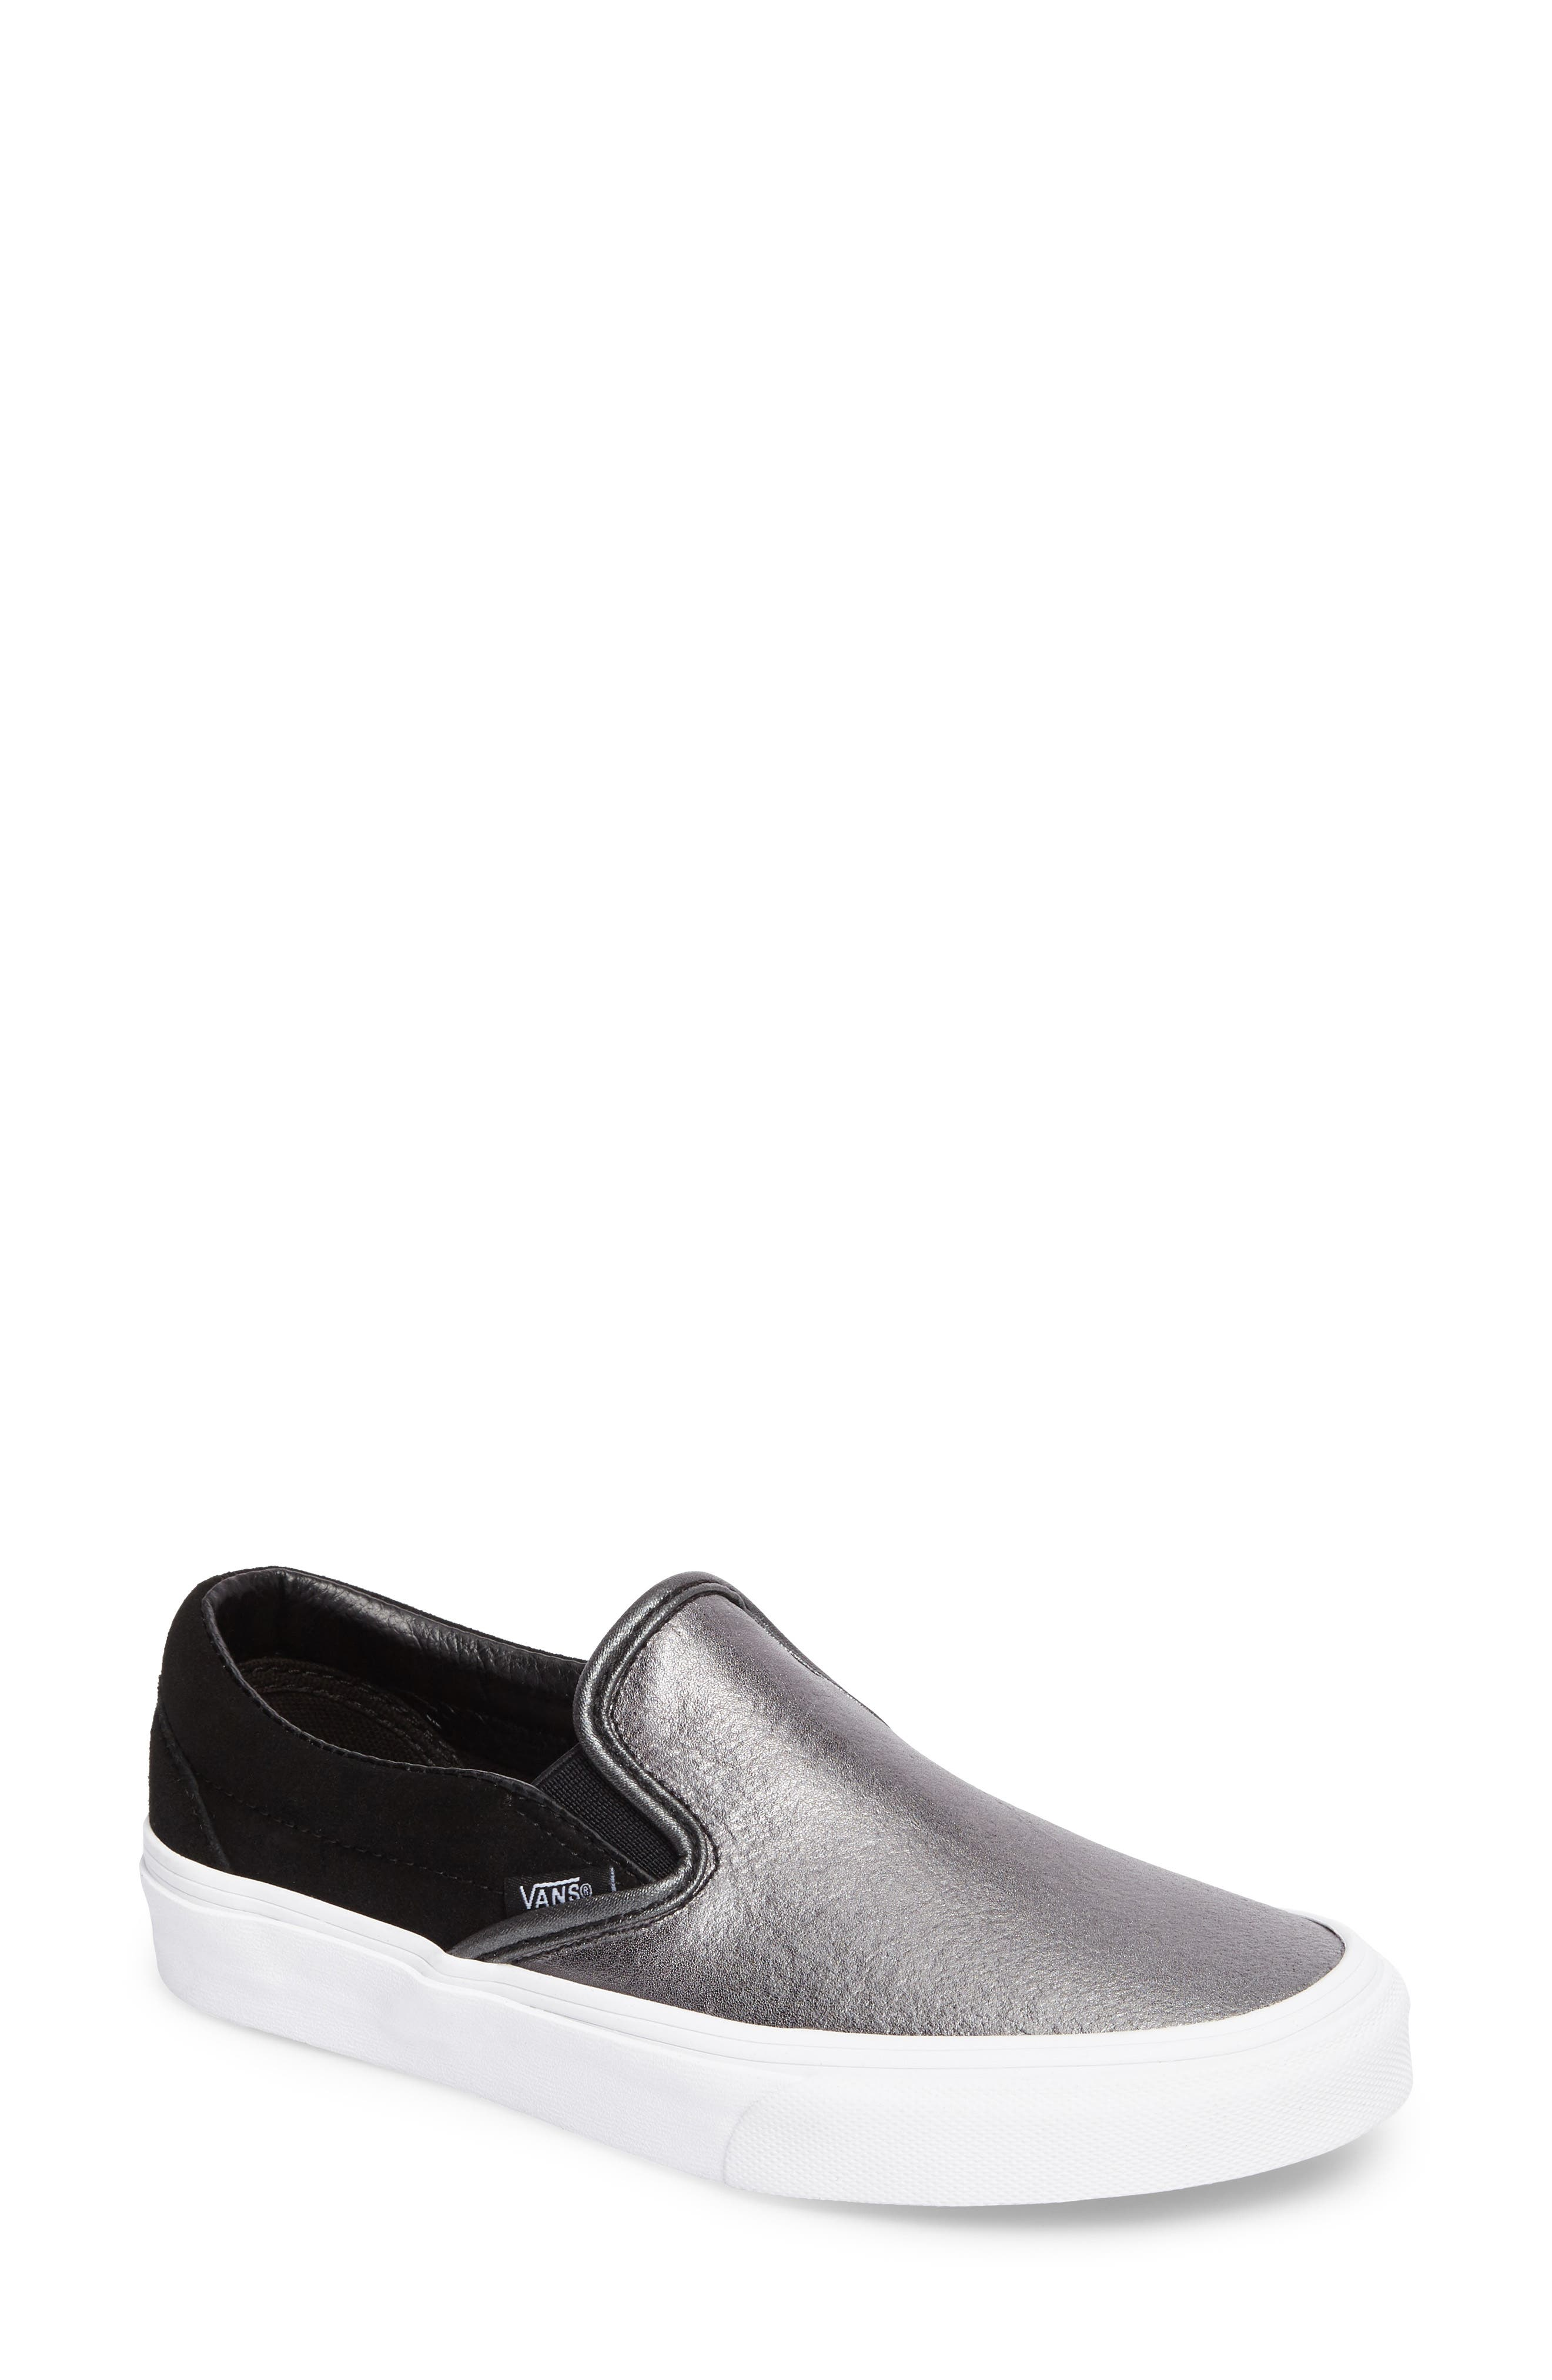 ,                             Classic Slip-On Sneaker,                             Main thumbnail 75, color,                             018